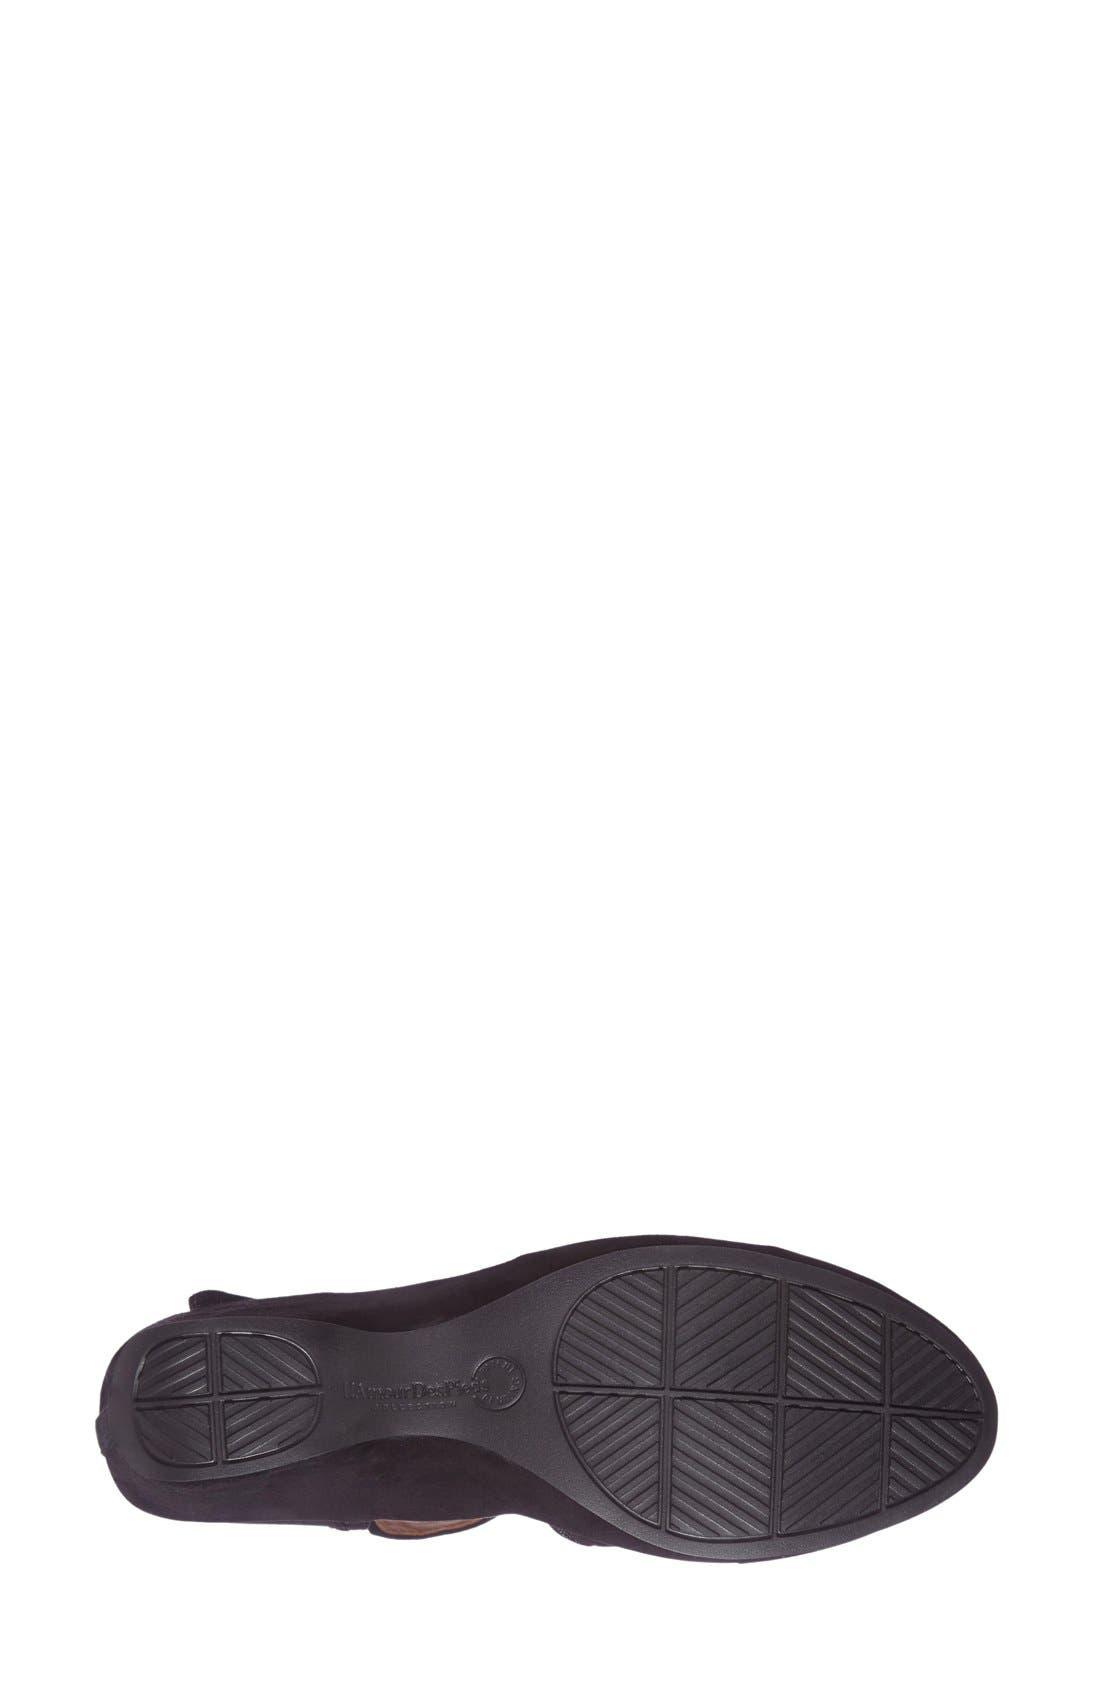 L'Amourdes Pieds'Orva' Wedge Sandal,                             Alternate thumbnail 4, color,                             BLACK KIDSUEDE